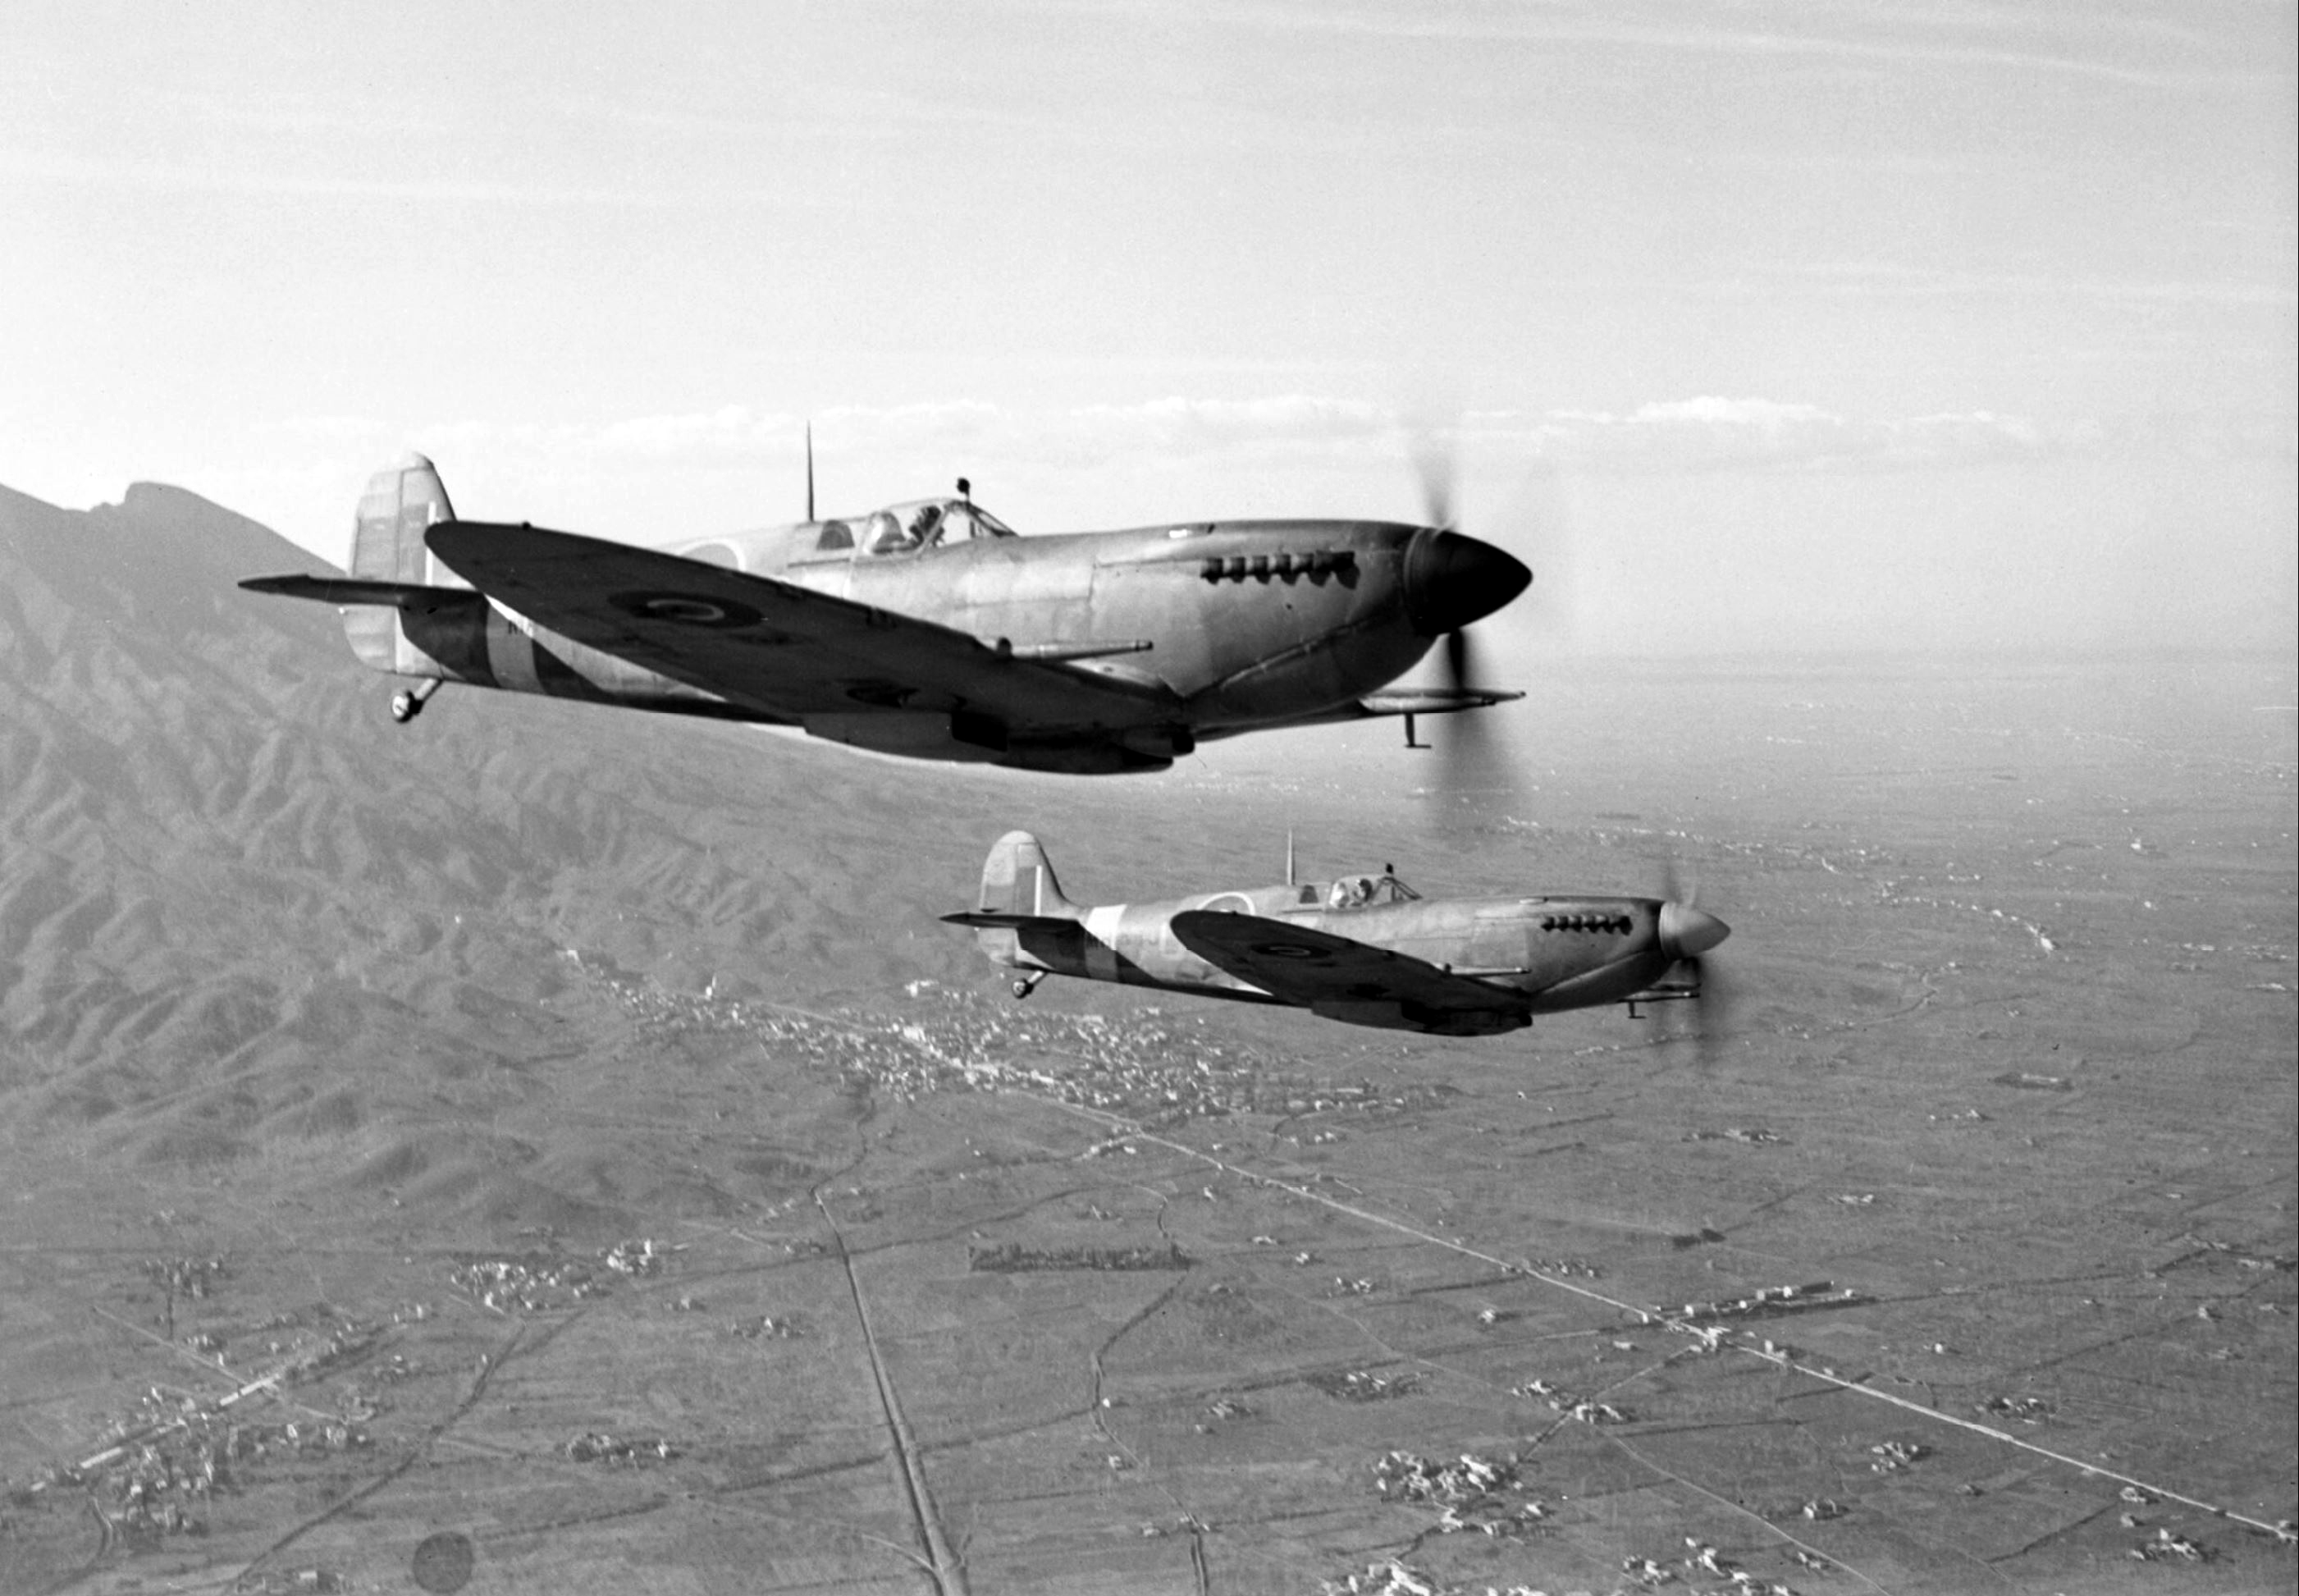 Spitfire MkIXe RAF 241Sqn RZR MA425 RZU MH635 over the Anzio beachhead Italy 1943 IWM CNA2499